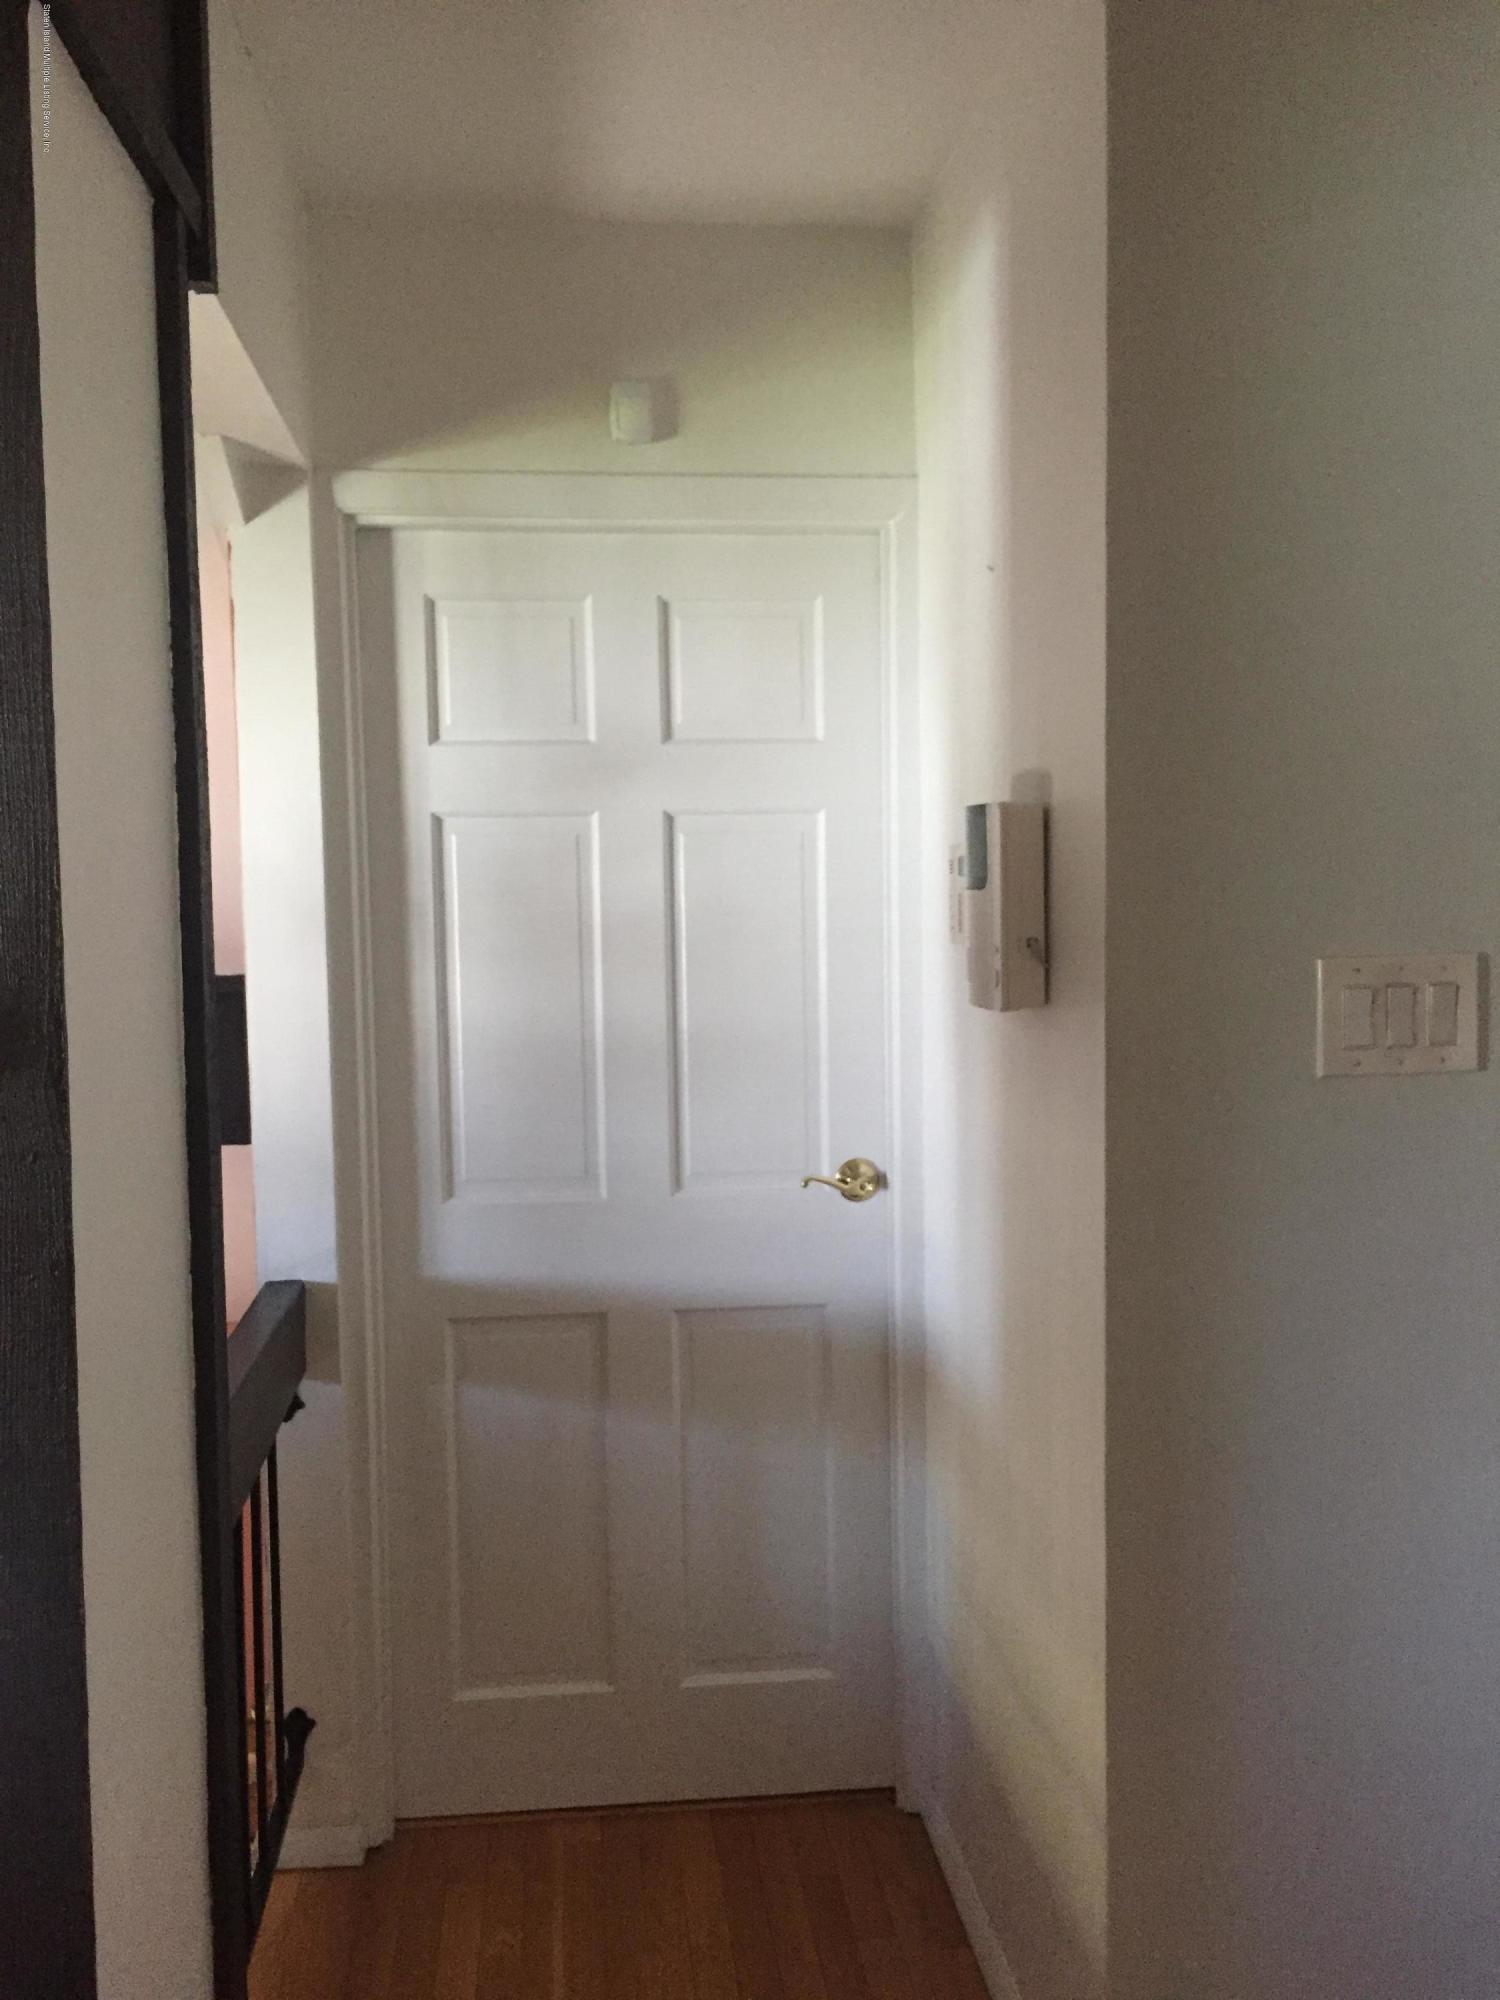 Single Family - Detached 46 Forrestal Avenue  Staten Island, NY 10312, MLS-1131922-21